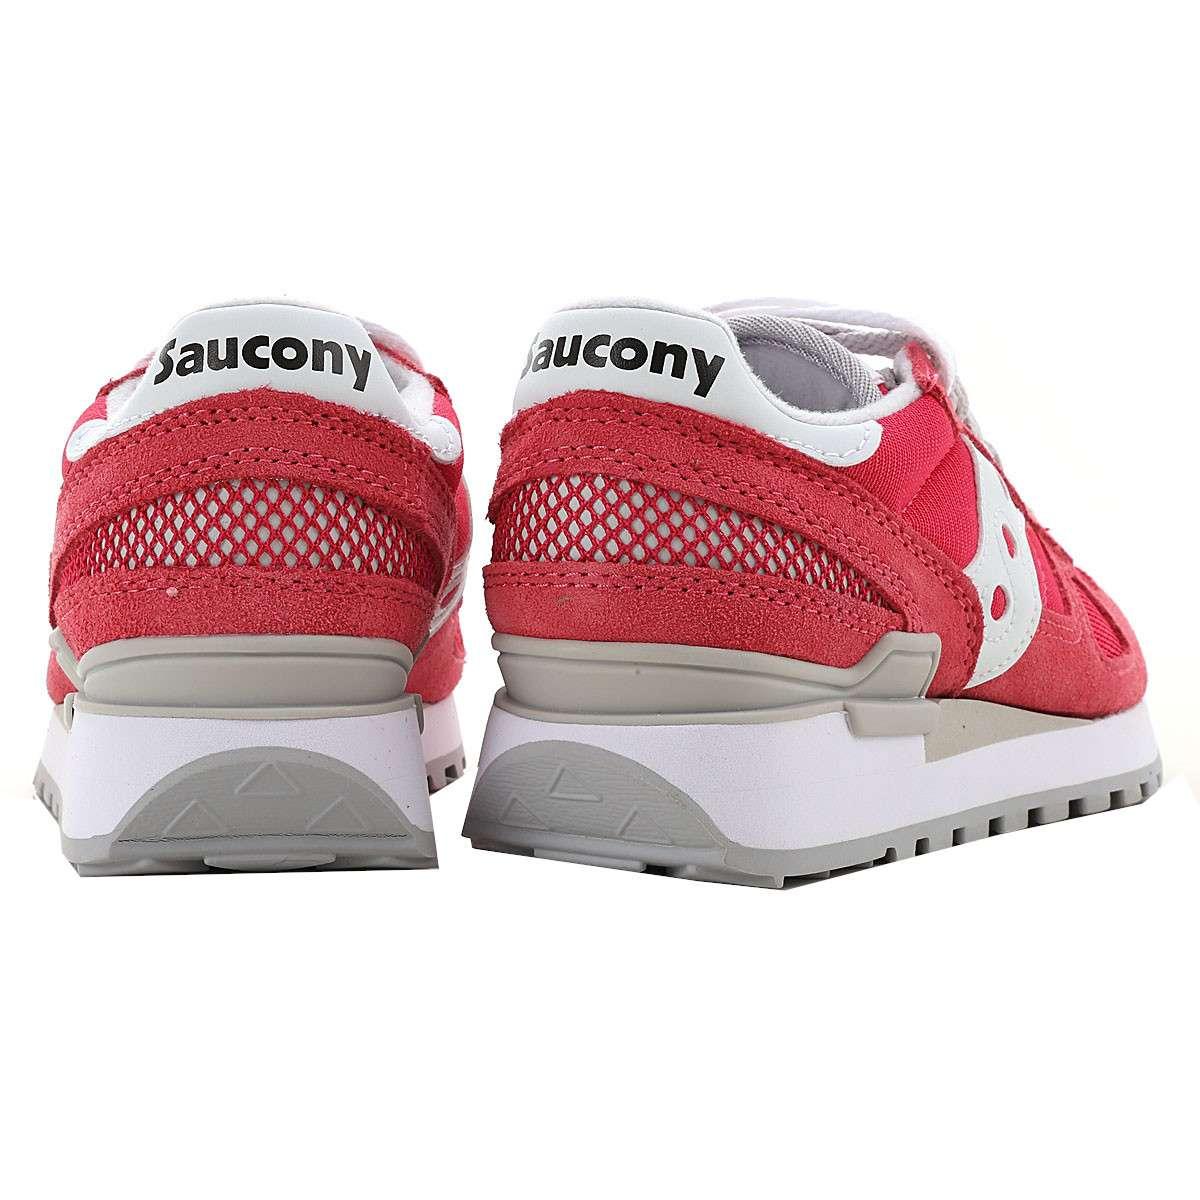 https://www.parmax.com/media/catalog/product/a/i/AI-Outlet_Parmax-Sneackers-Saucony-S1108-677-D.jpg